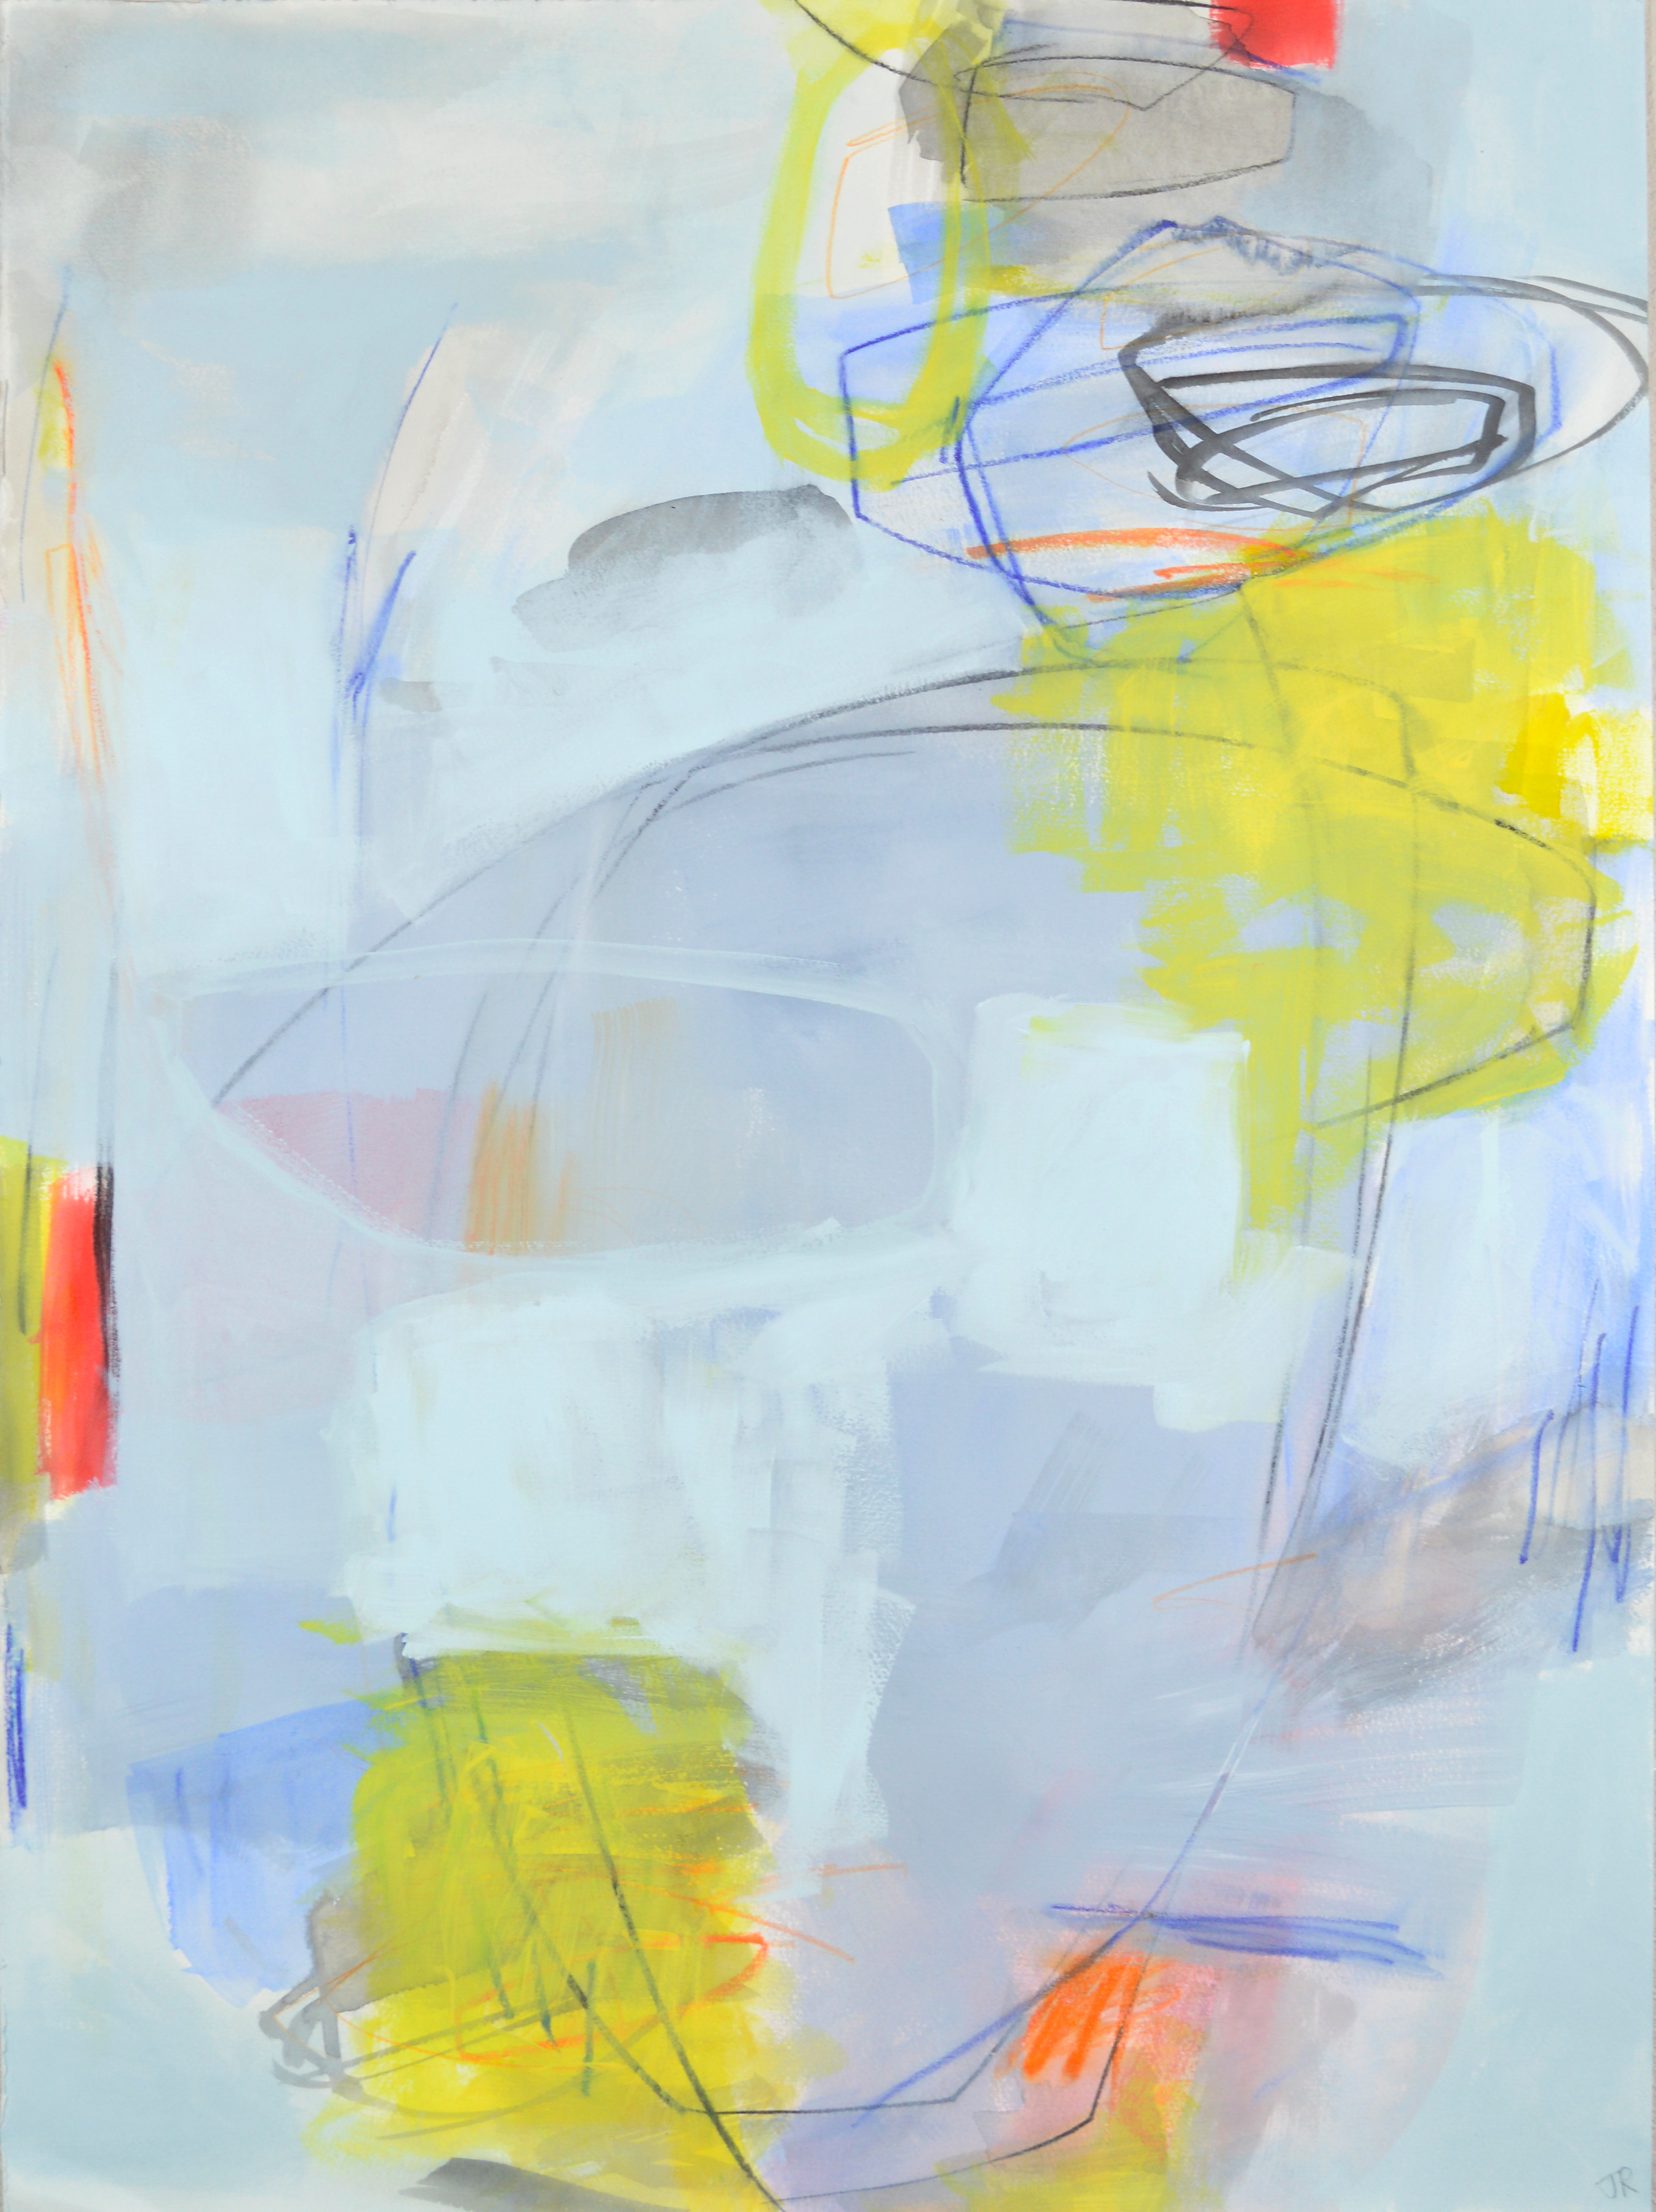 Fog & Mist by Julia Rymer | ArtworkNetwork.com